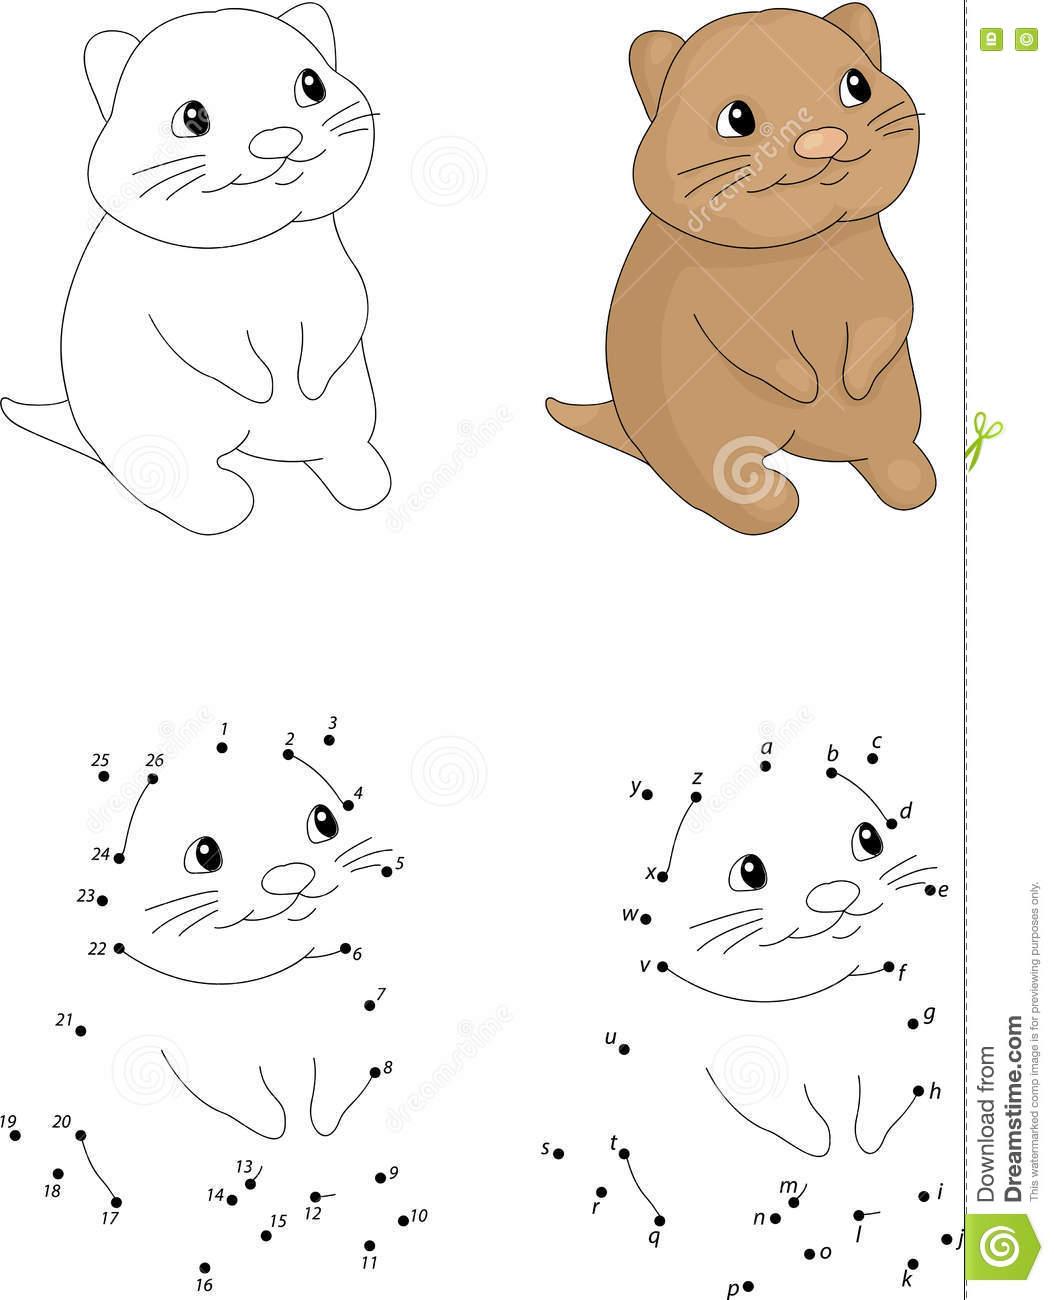 Quokka coloring #17, Download drawings